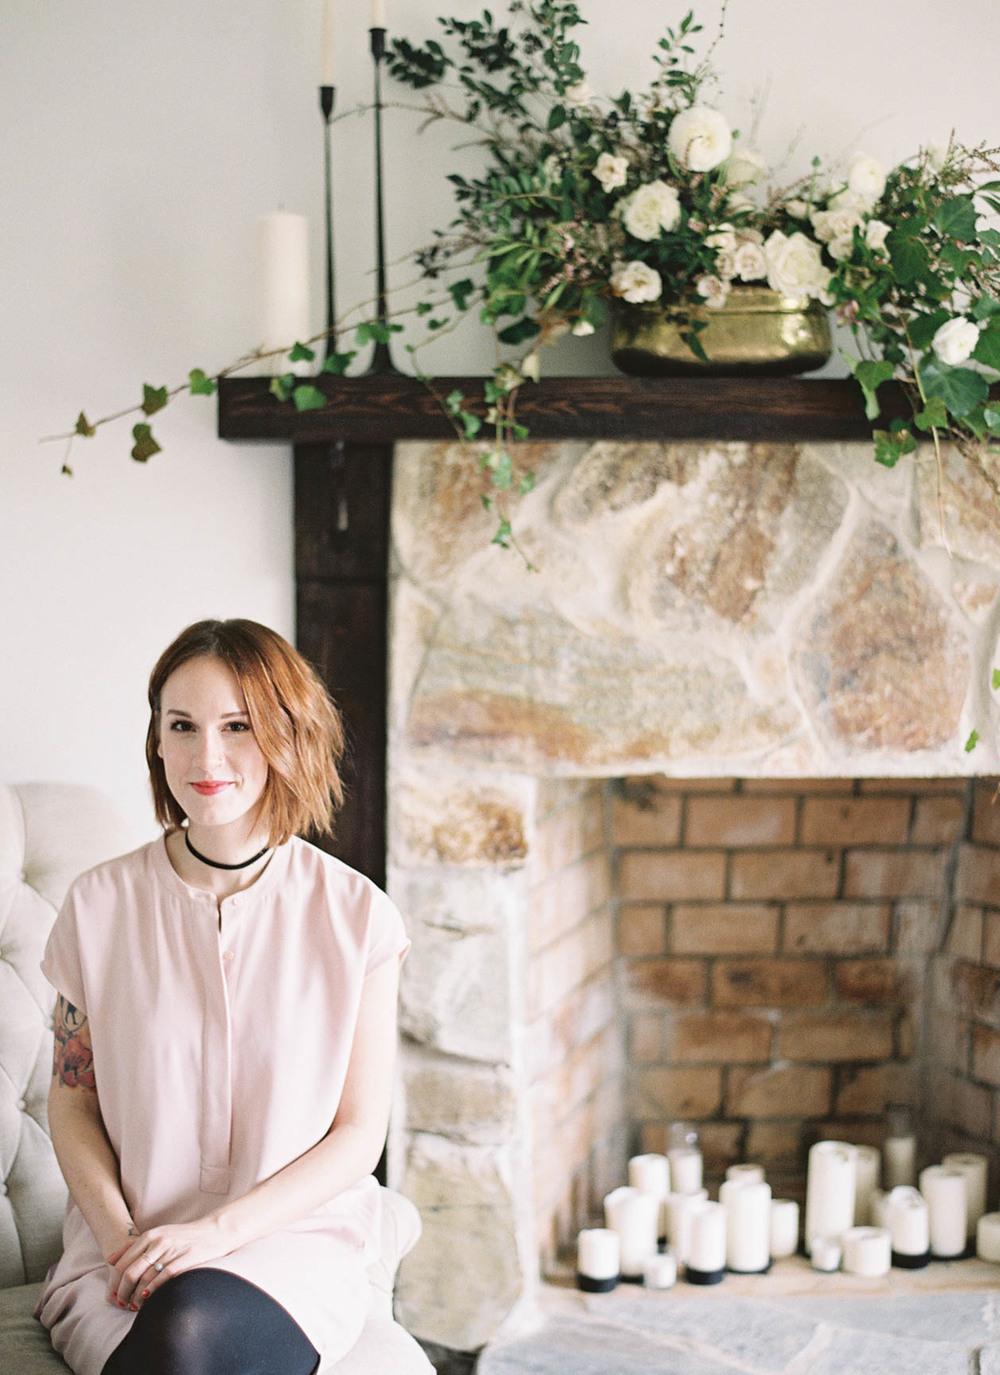 Afternoon Tea Bridal Shower | cottagehillmag.com